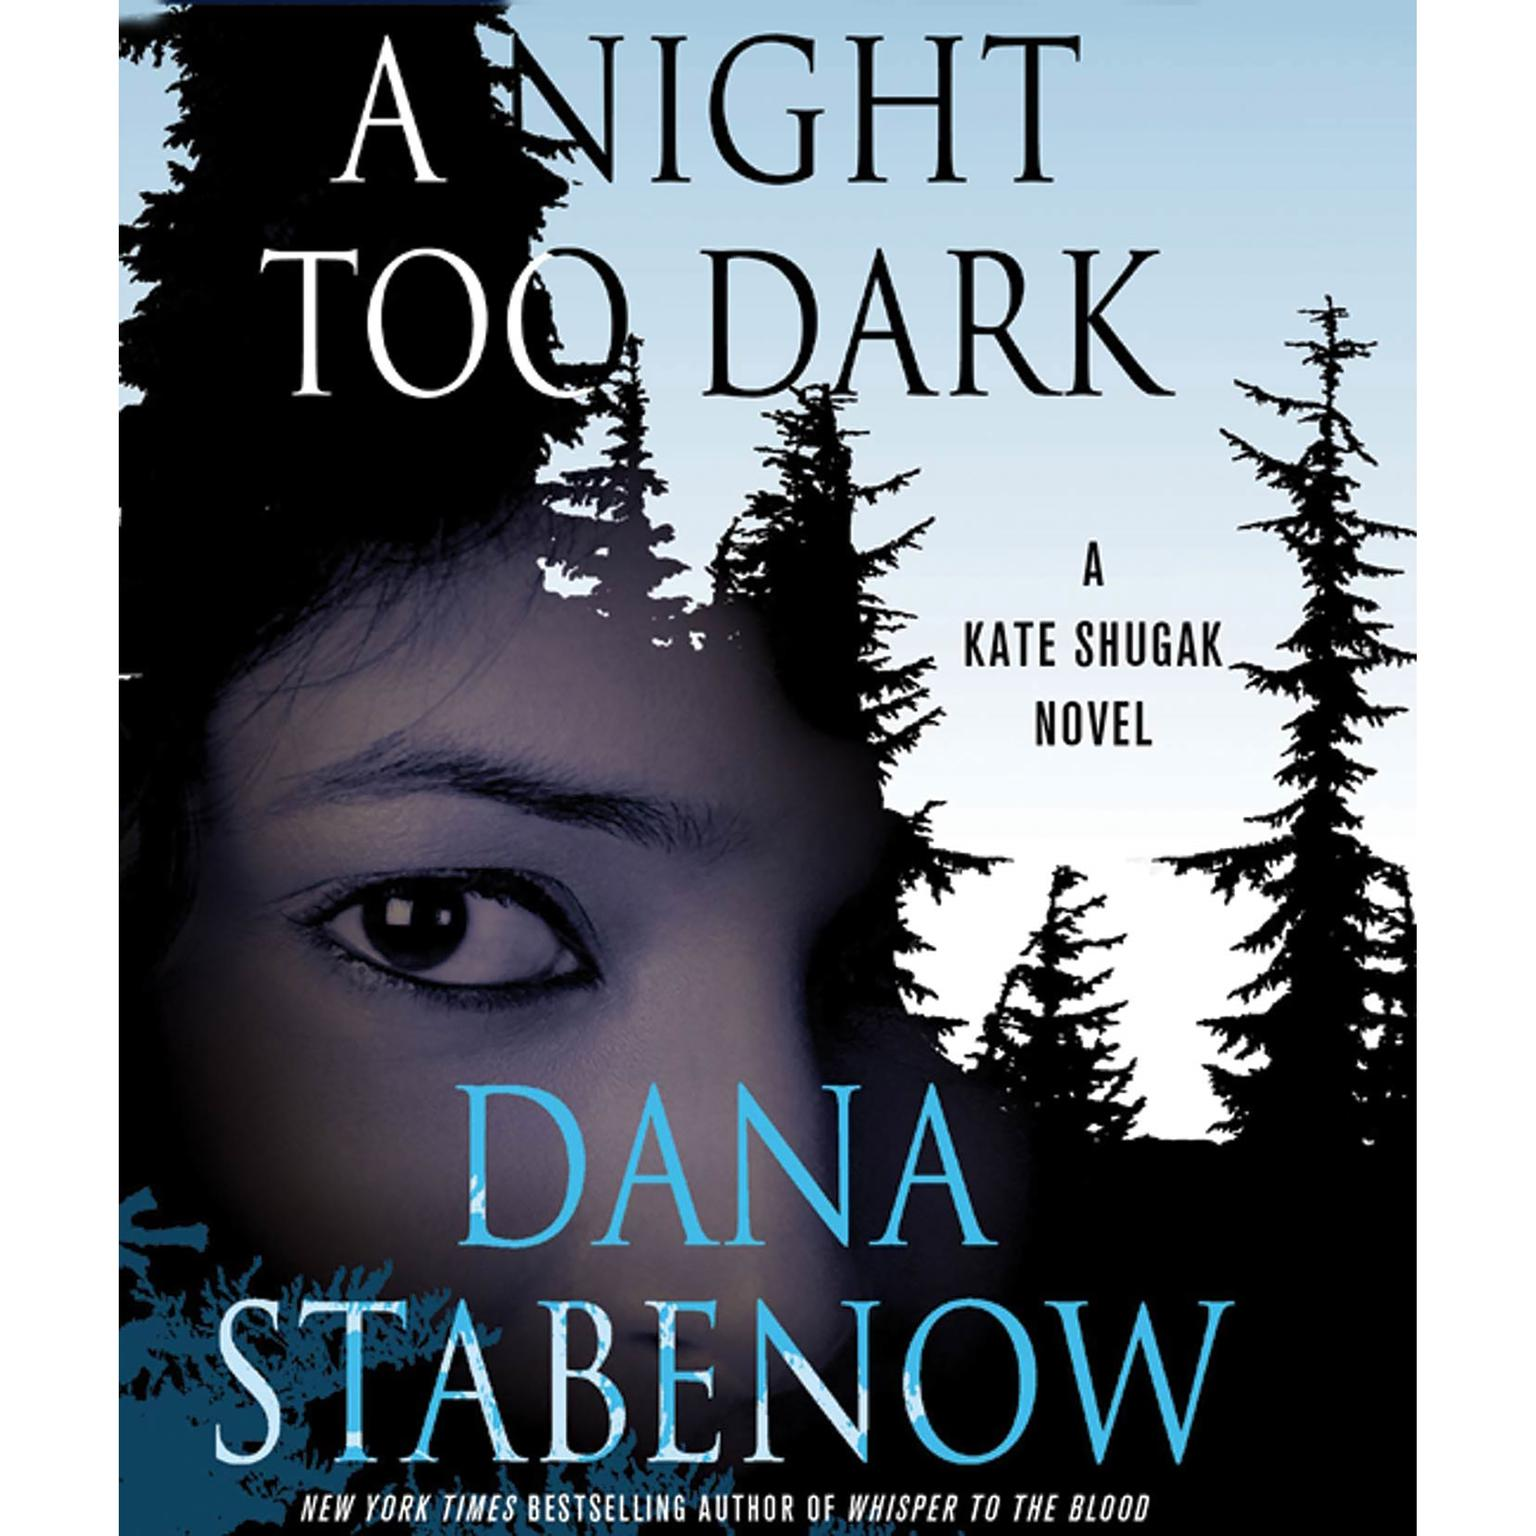 Printable A Night Too Dark: A Kate Shugak Novel Audiobook Cover Art